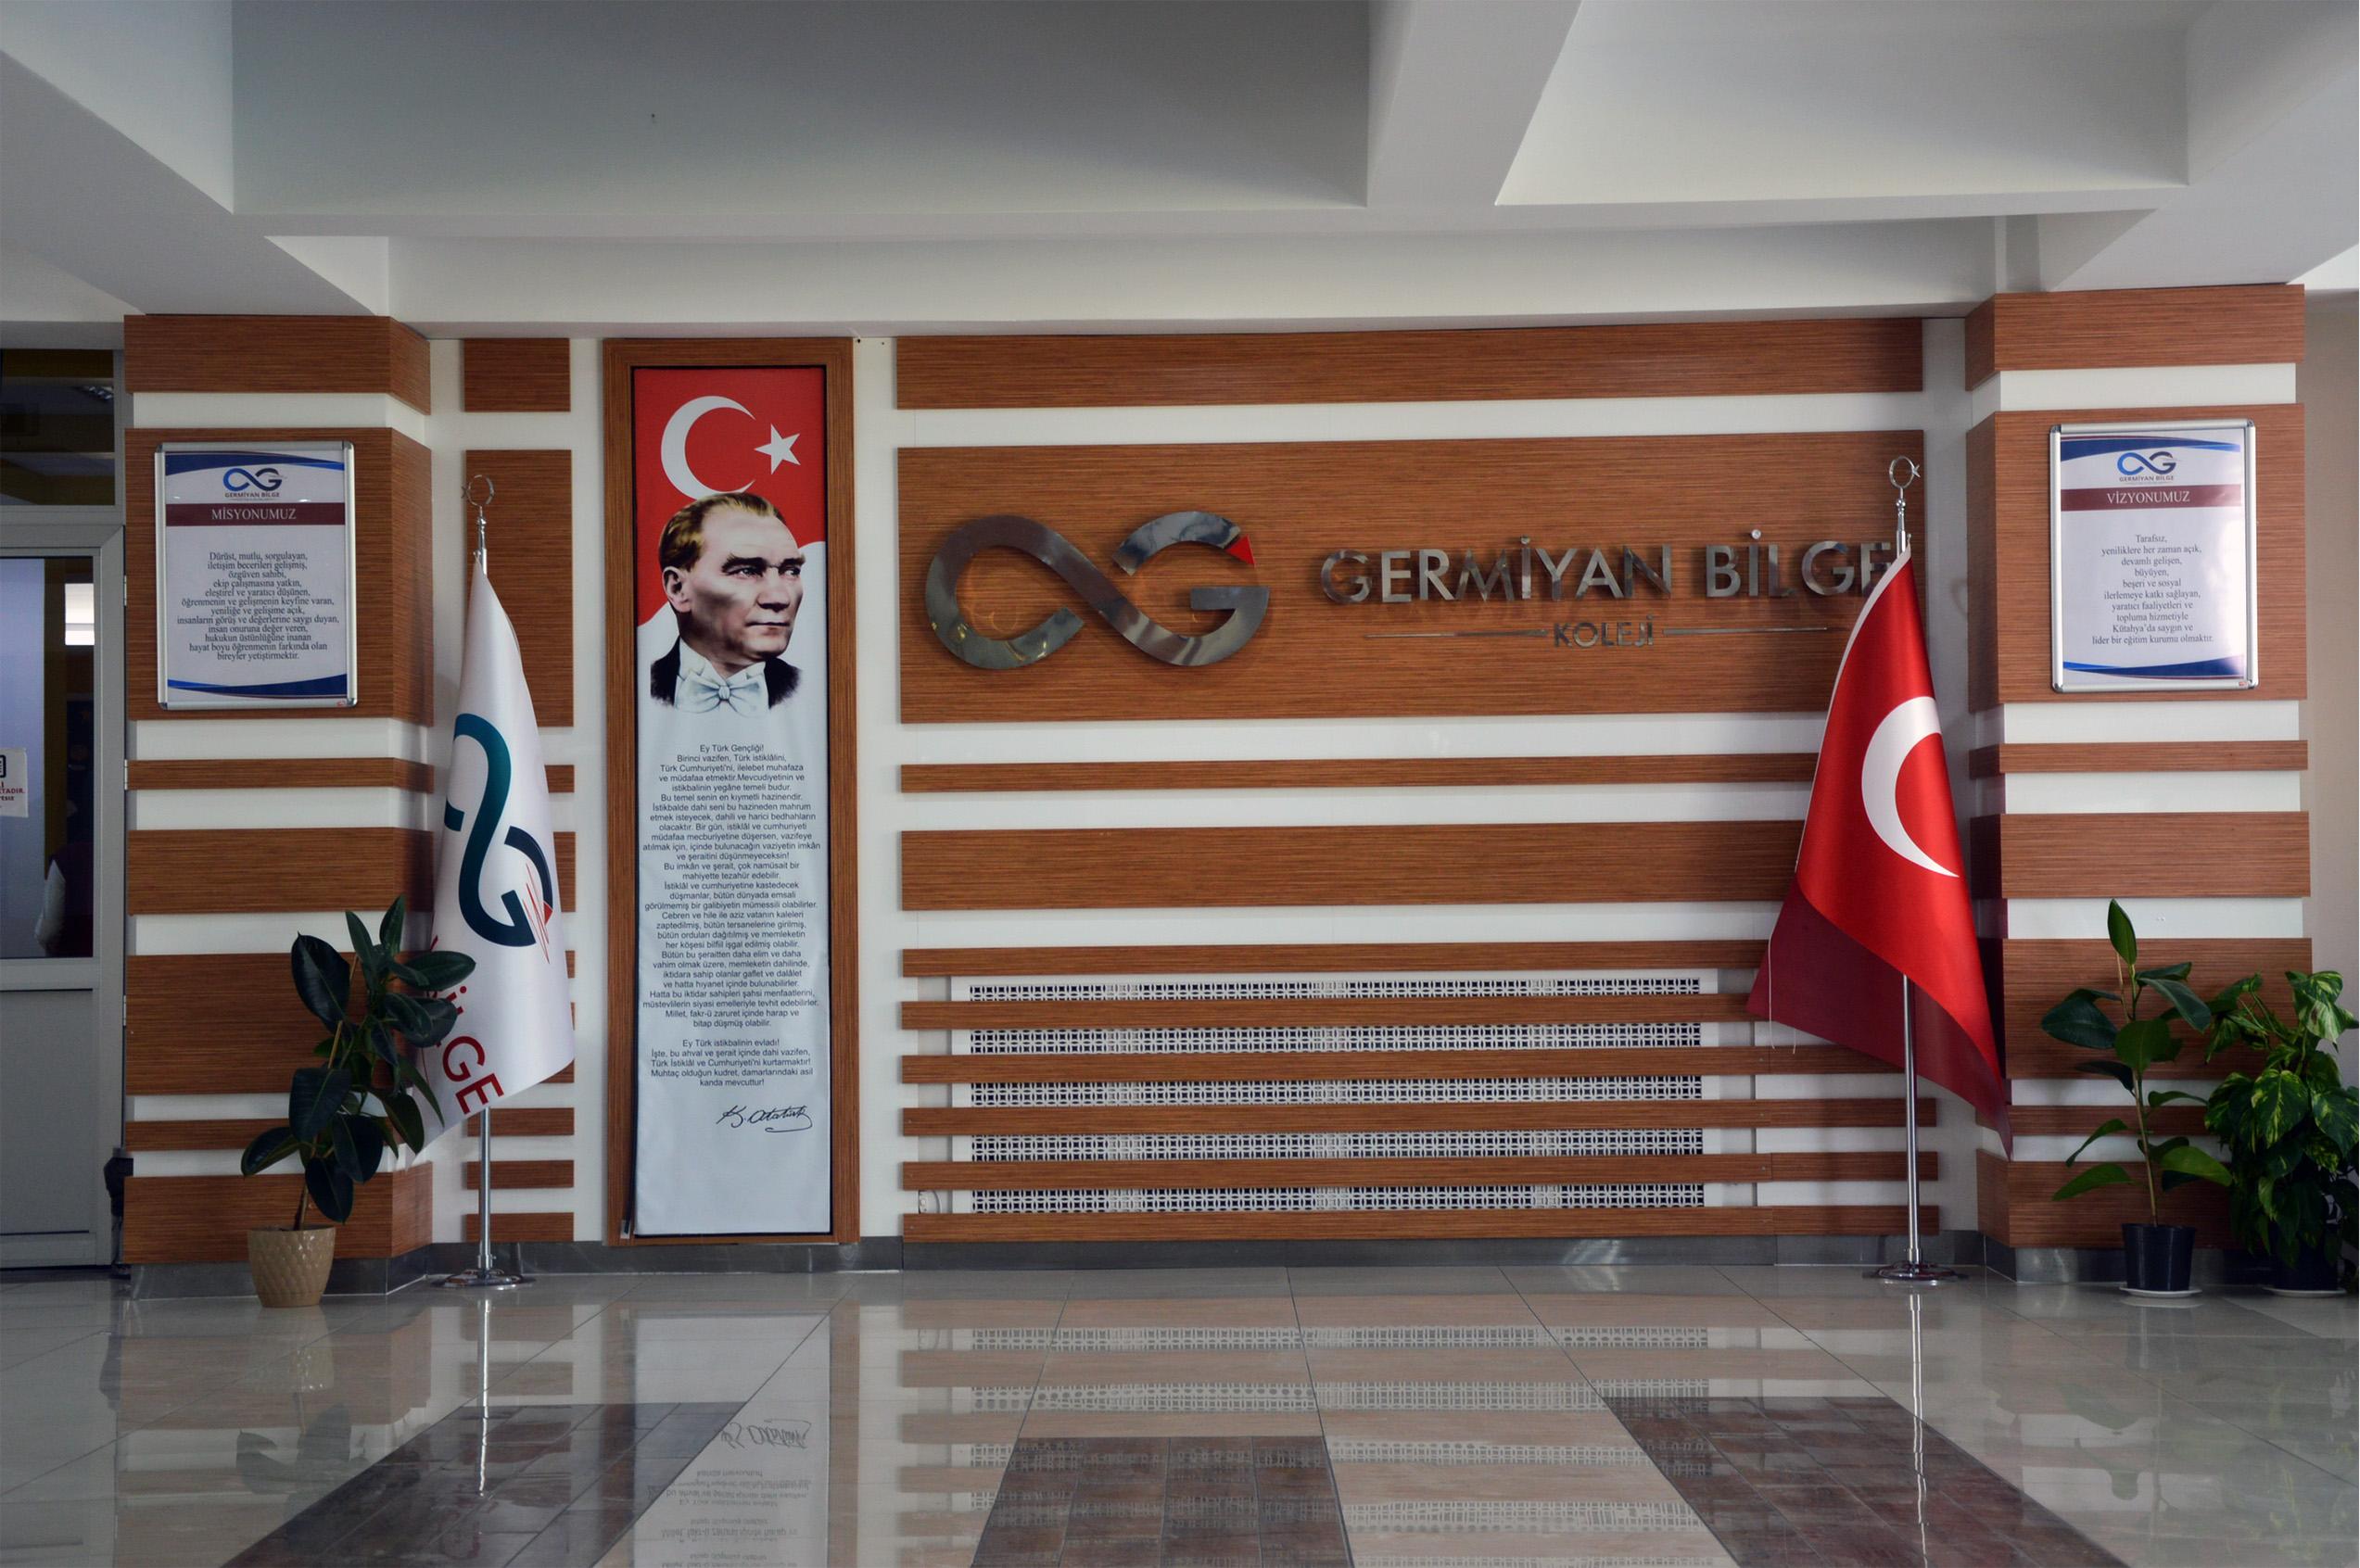 Germiyan-Bilge-Koleji-03